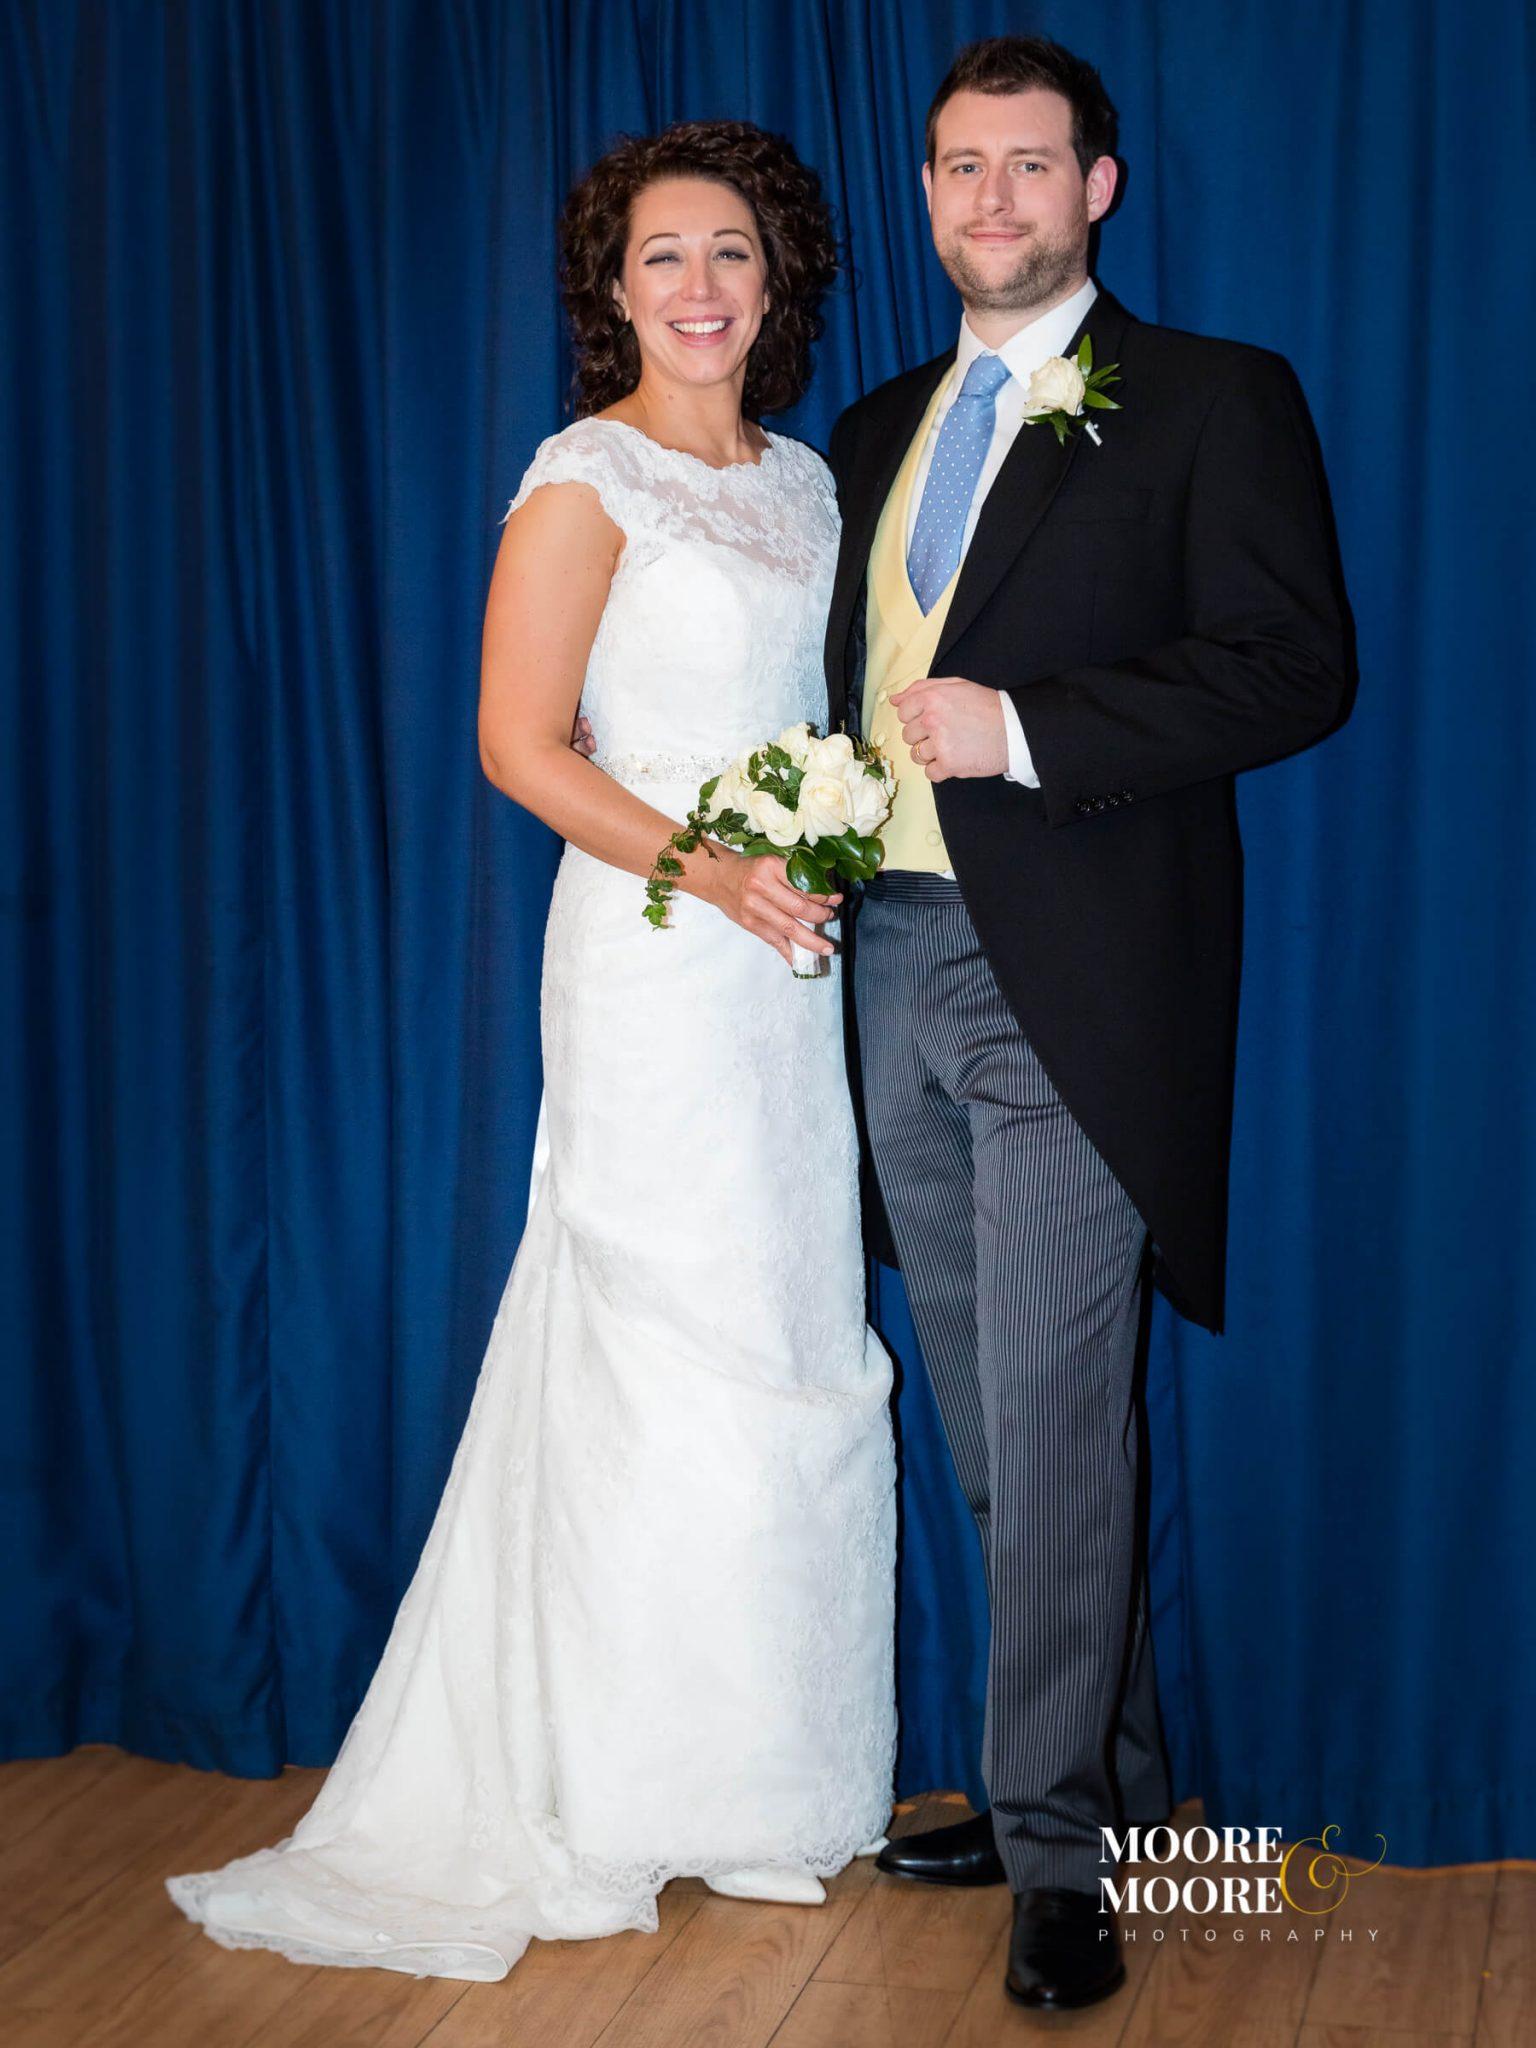 wedding photography by Hampshire Wedding Photographer, Helen Moore of Moore&Moore Photography